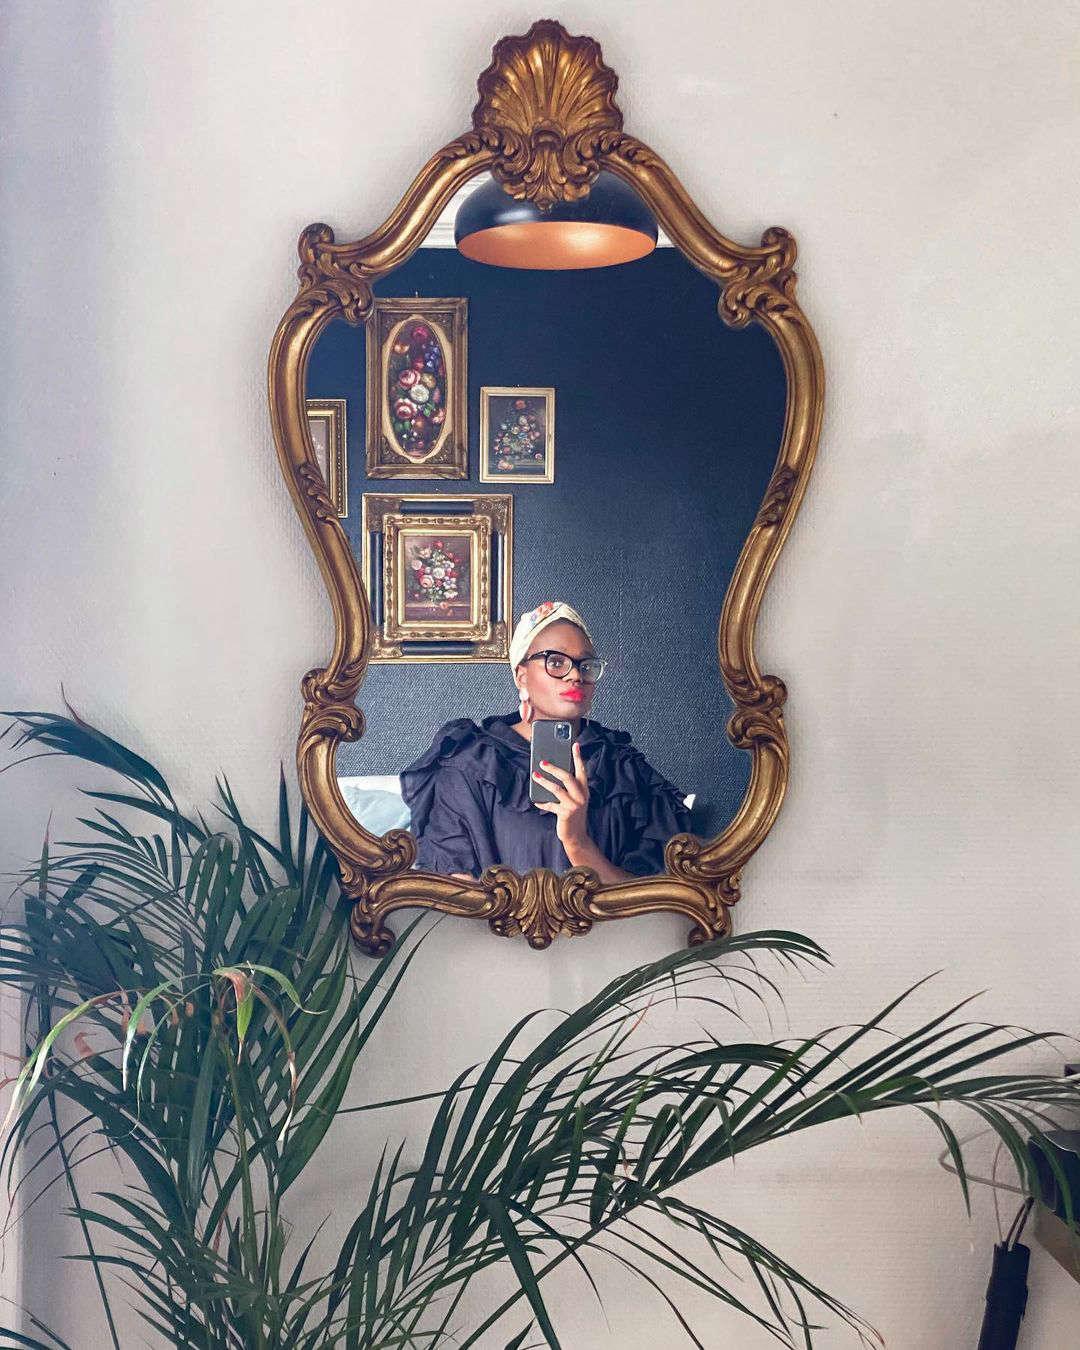 Ajiri in an antique gilded mirror she found, via her Instagram (@ajiriaki).